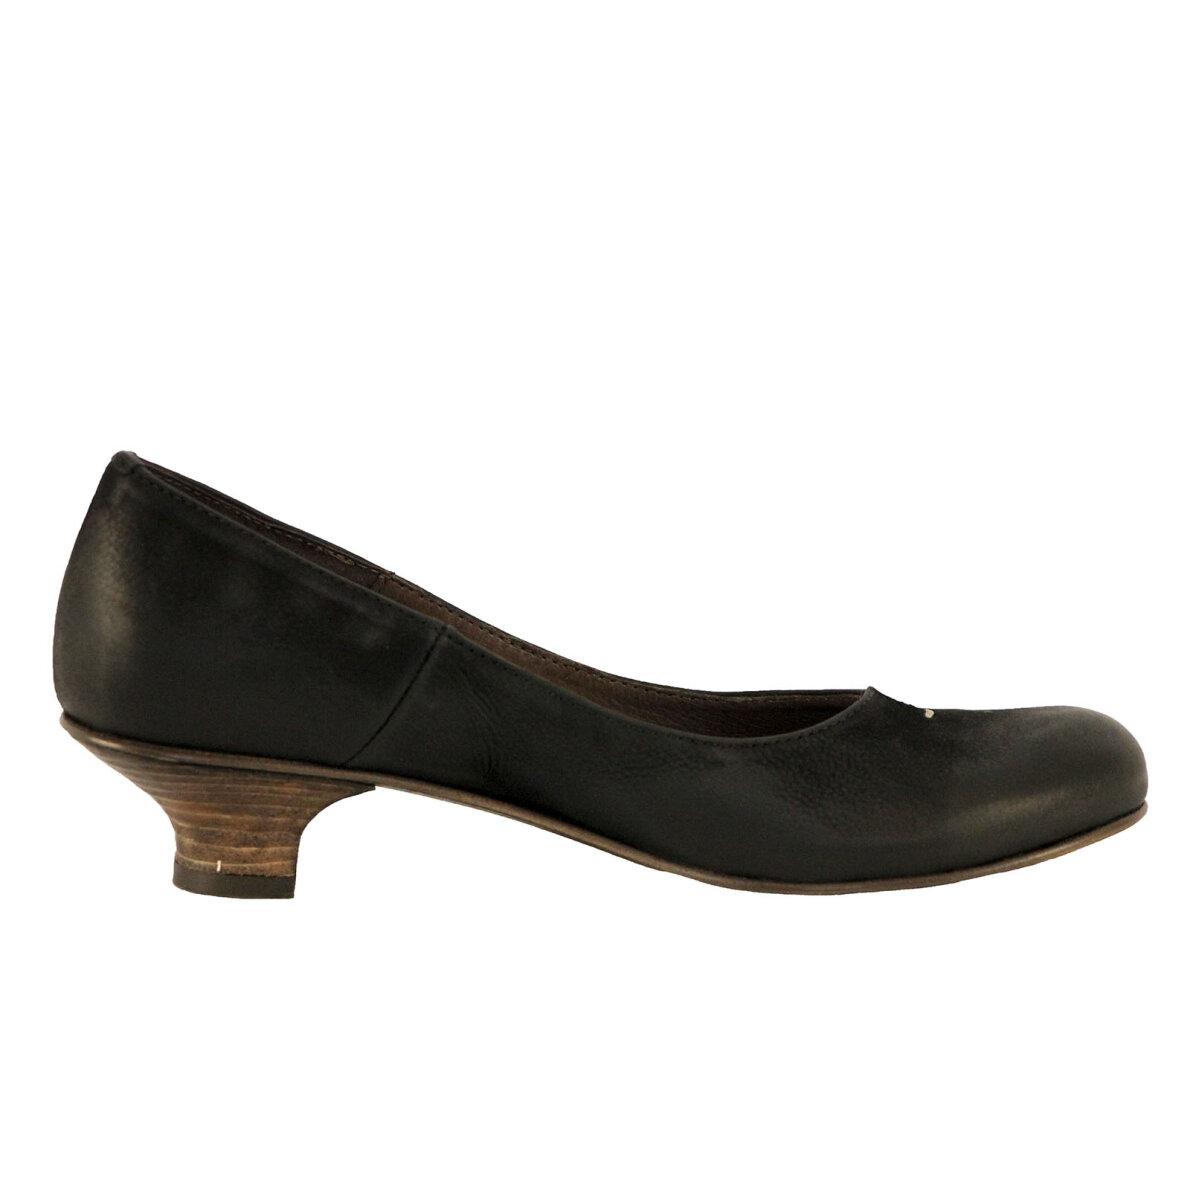 tilbud på birkenstock sandaler